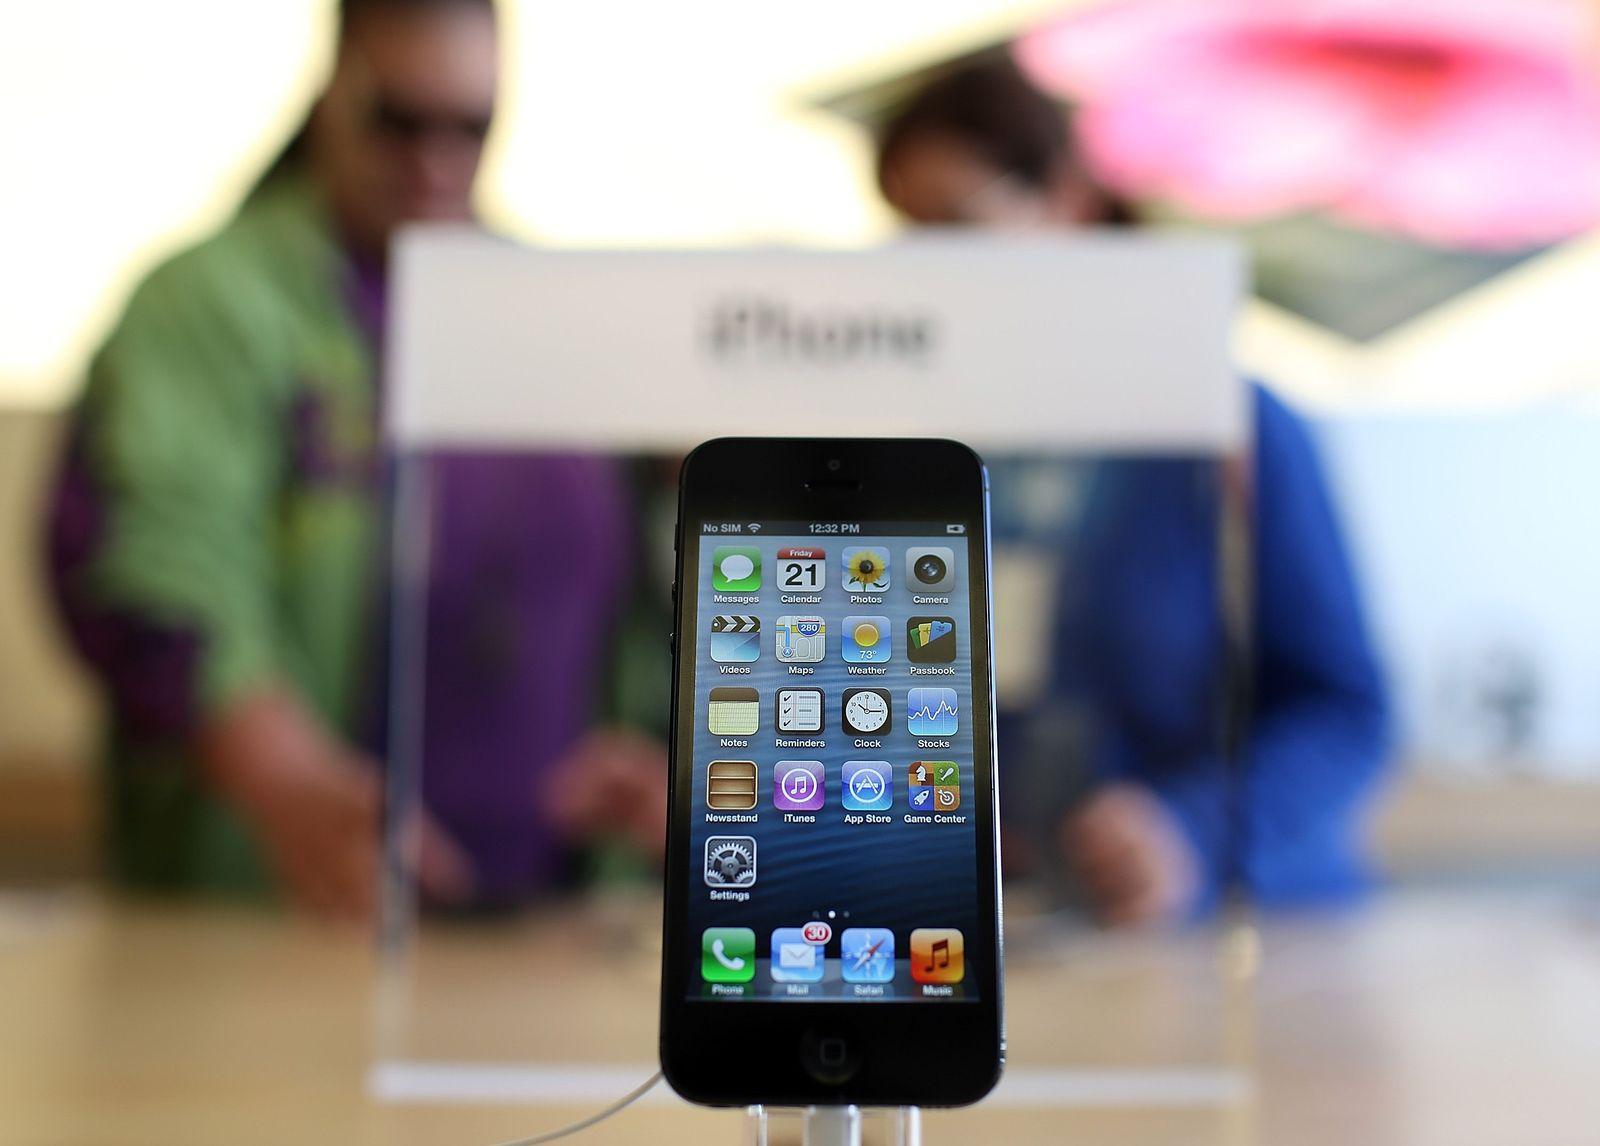 iPhone 5 Apple Store